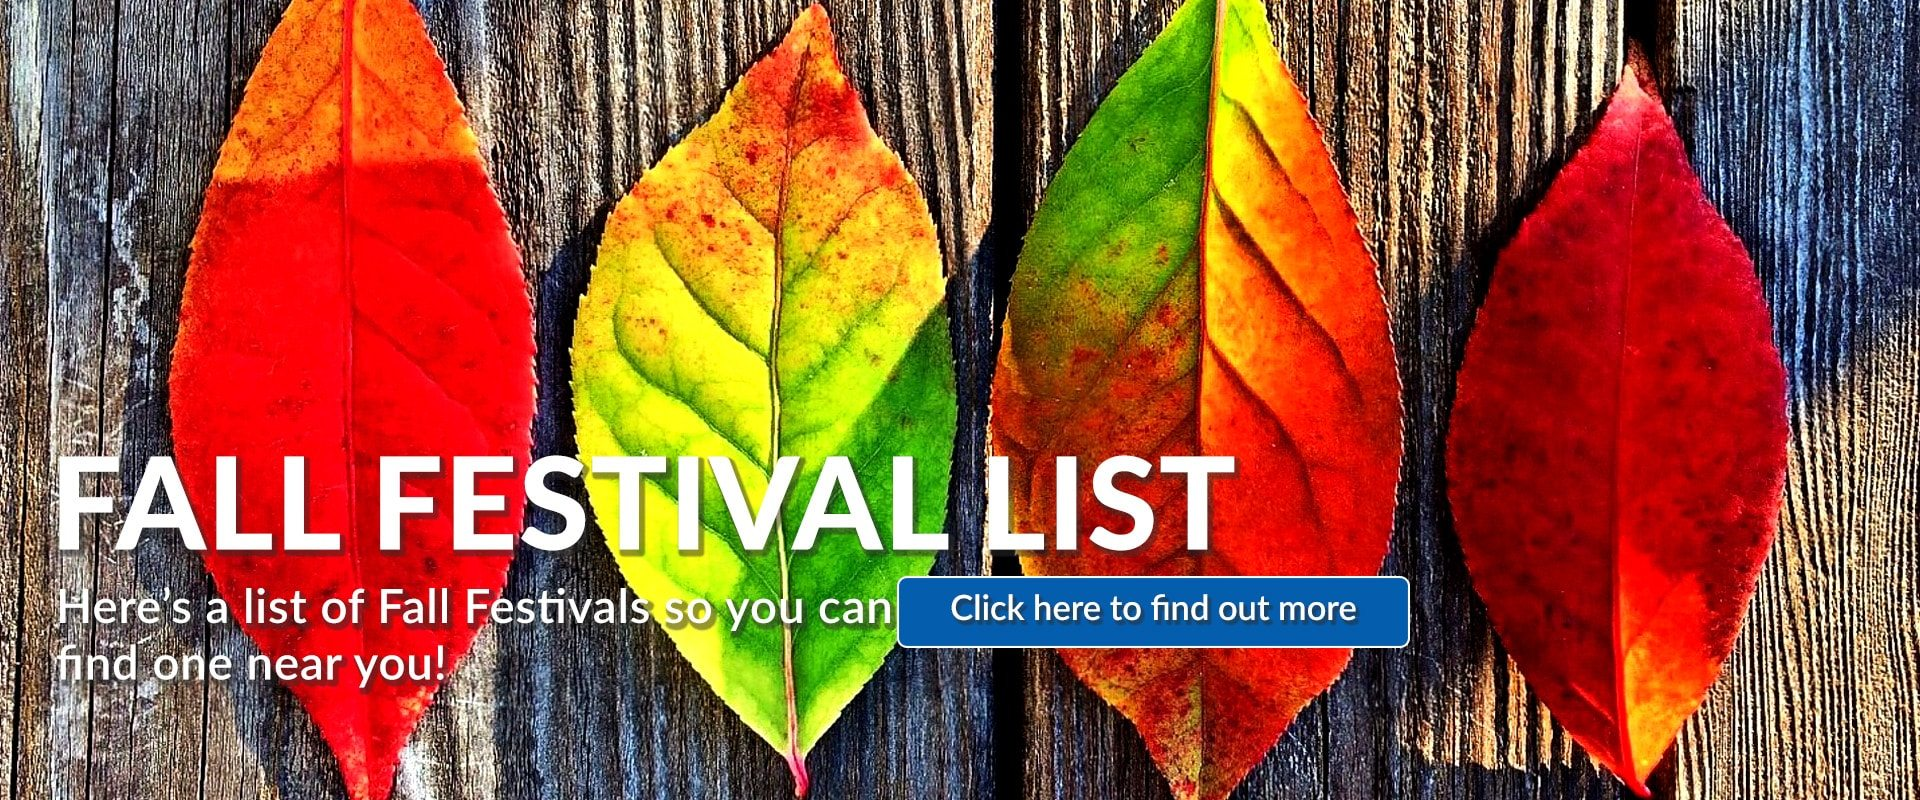 91.3 KGLY East Texas Christian Radio Fall Festivals List